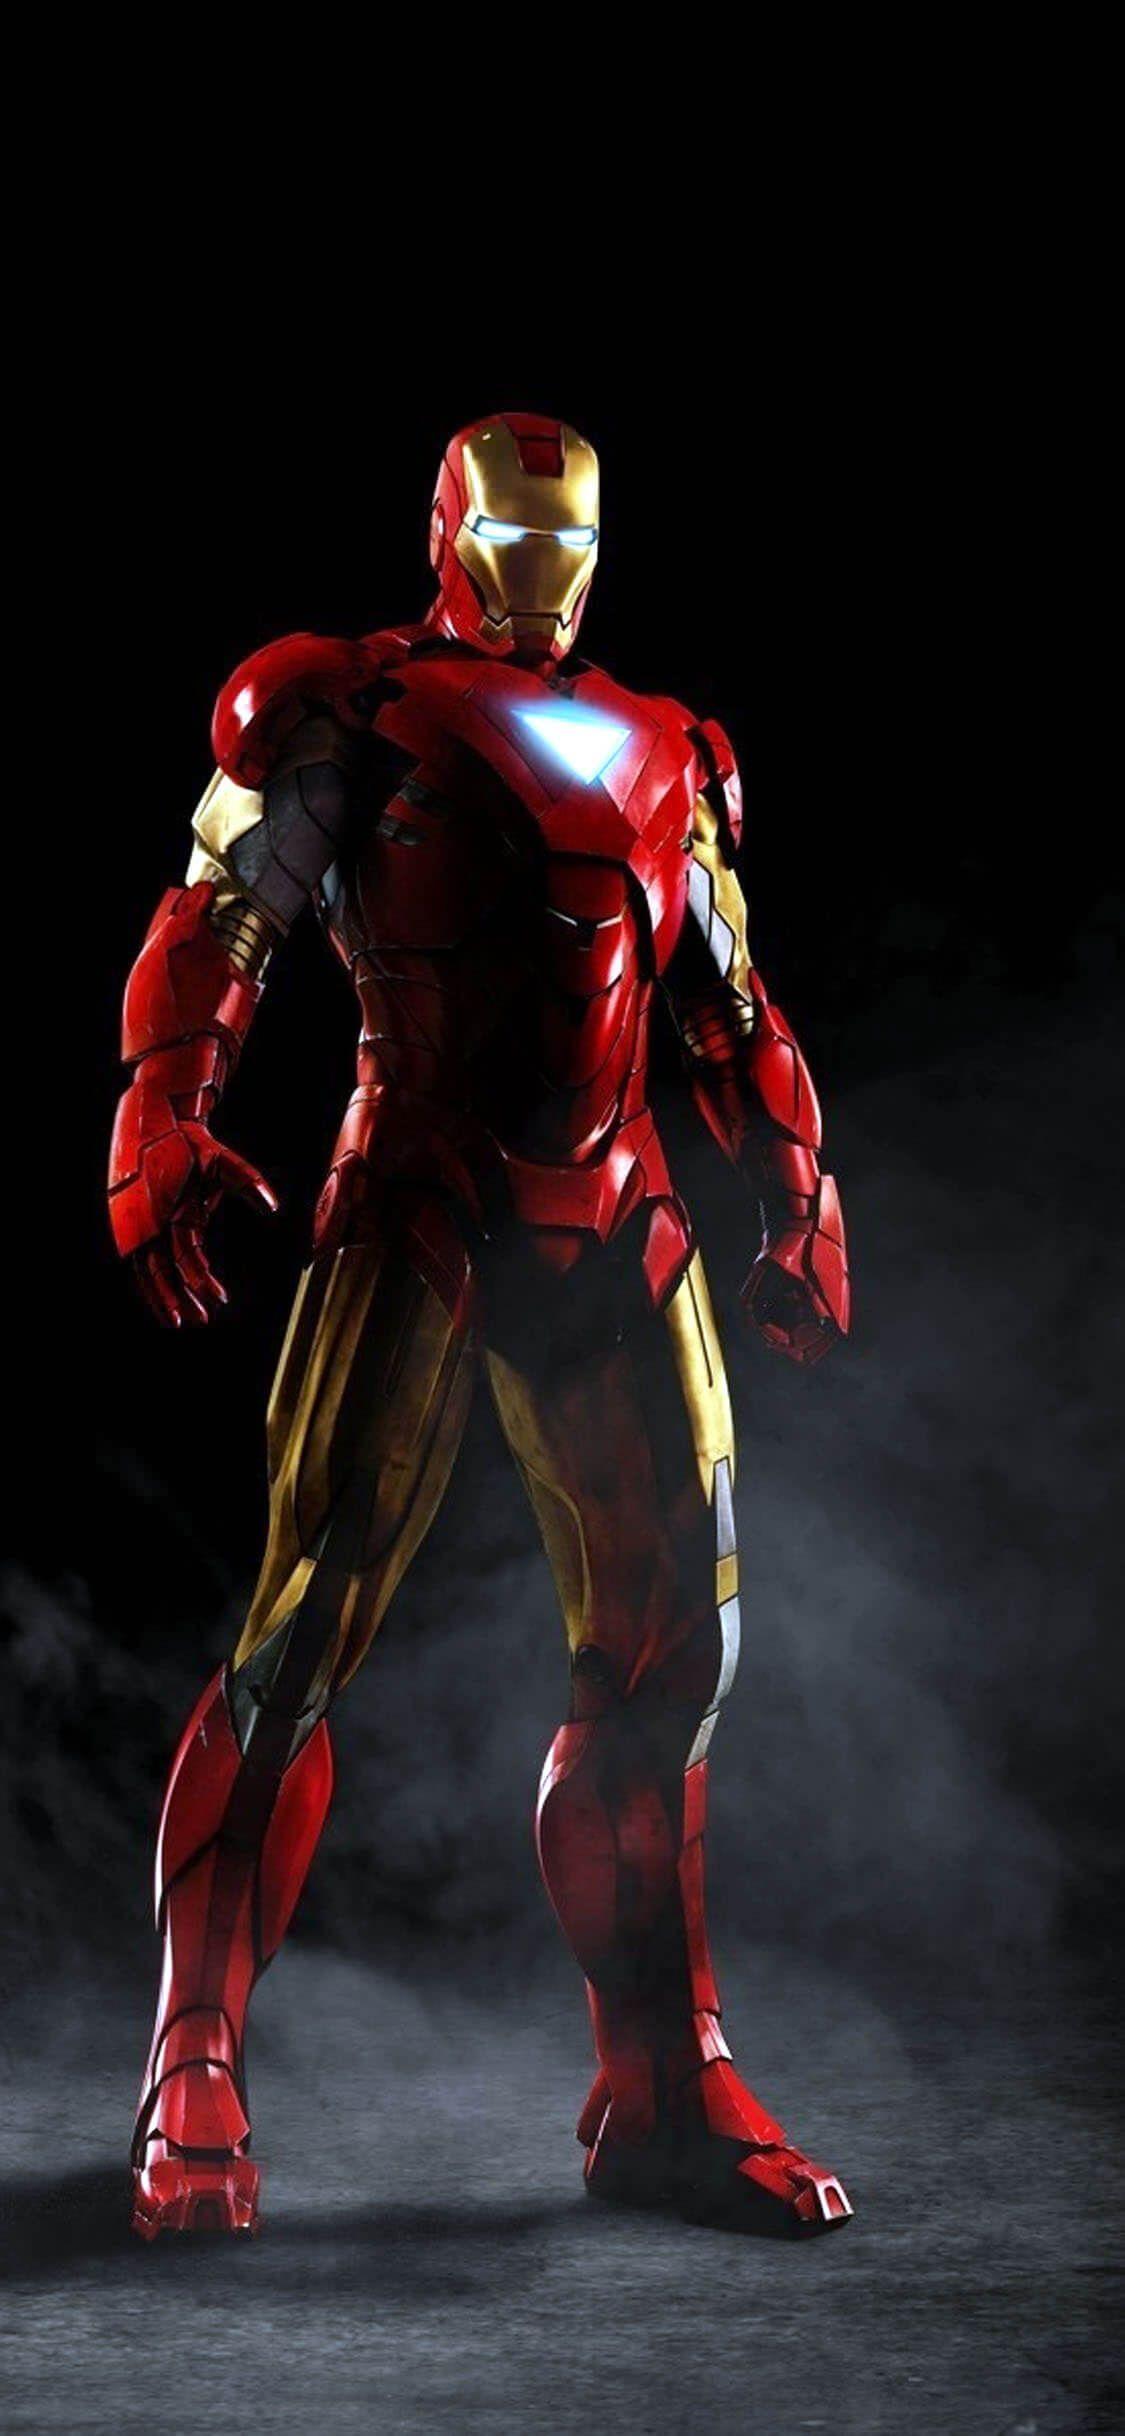 35+ Best Iron Man Iphone Wallpapers 2019 Iron man